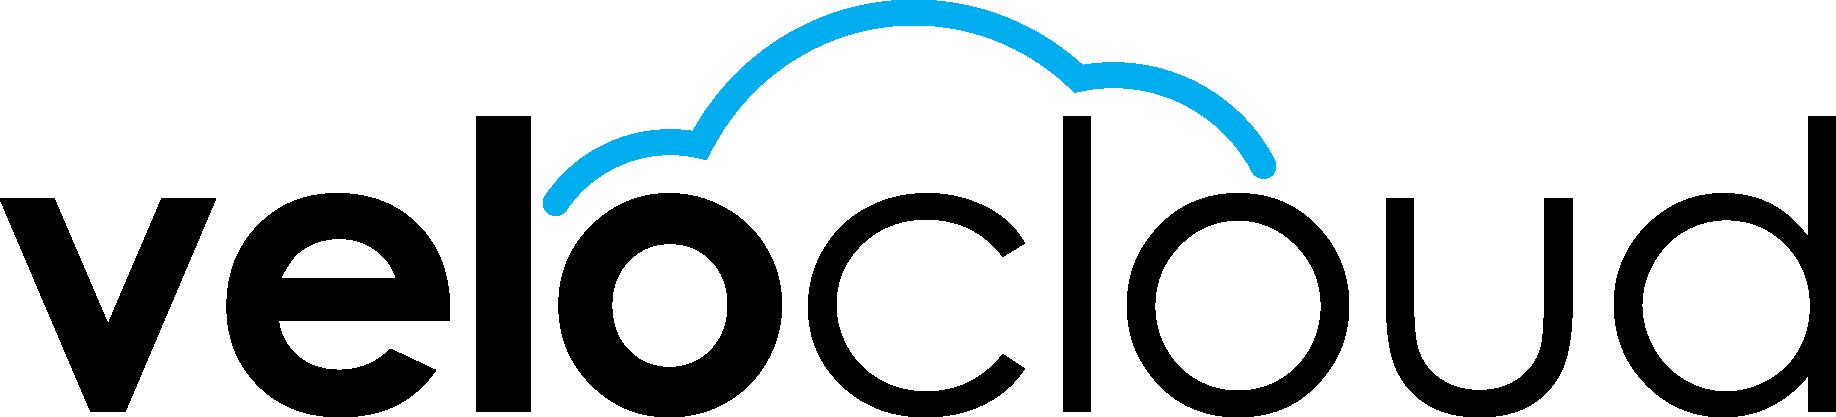 Matrix Networks is a premier VeloCloud partner in Portland Oregon